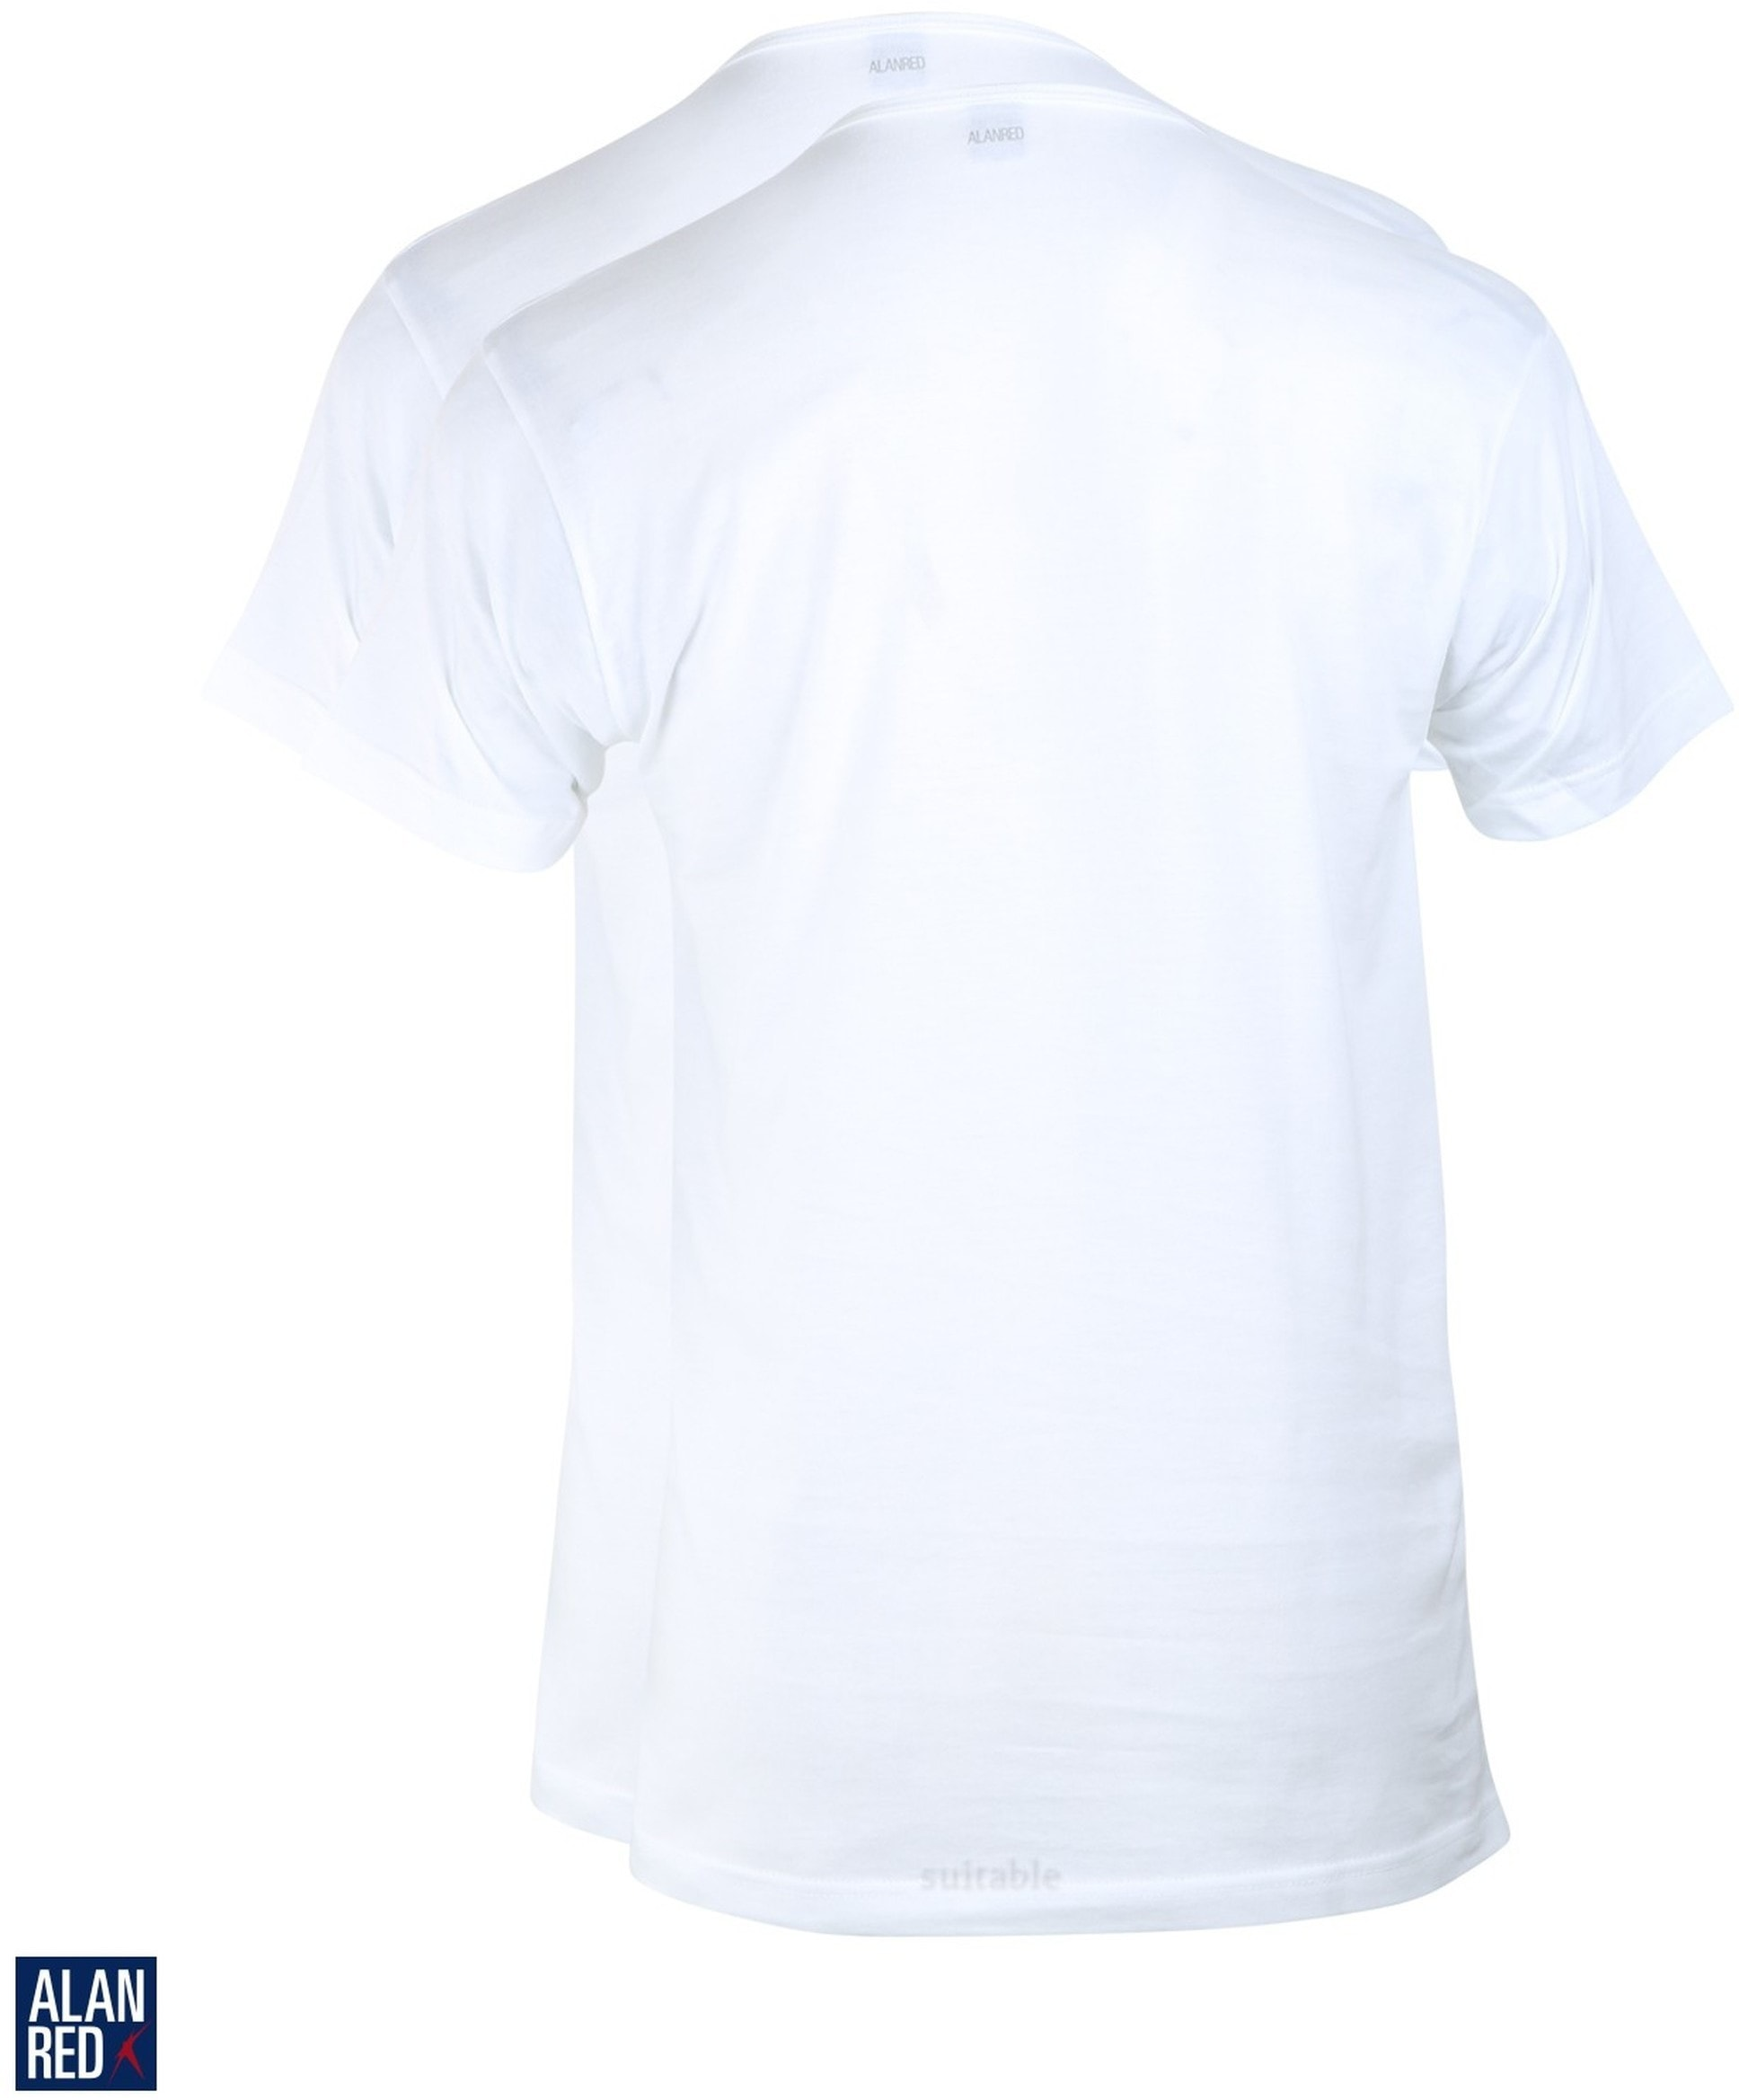 Alan Red T-Shirt Derby Weiß  (2er-Pack) foto 2